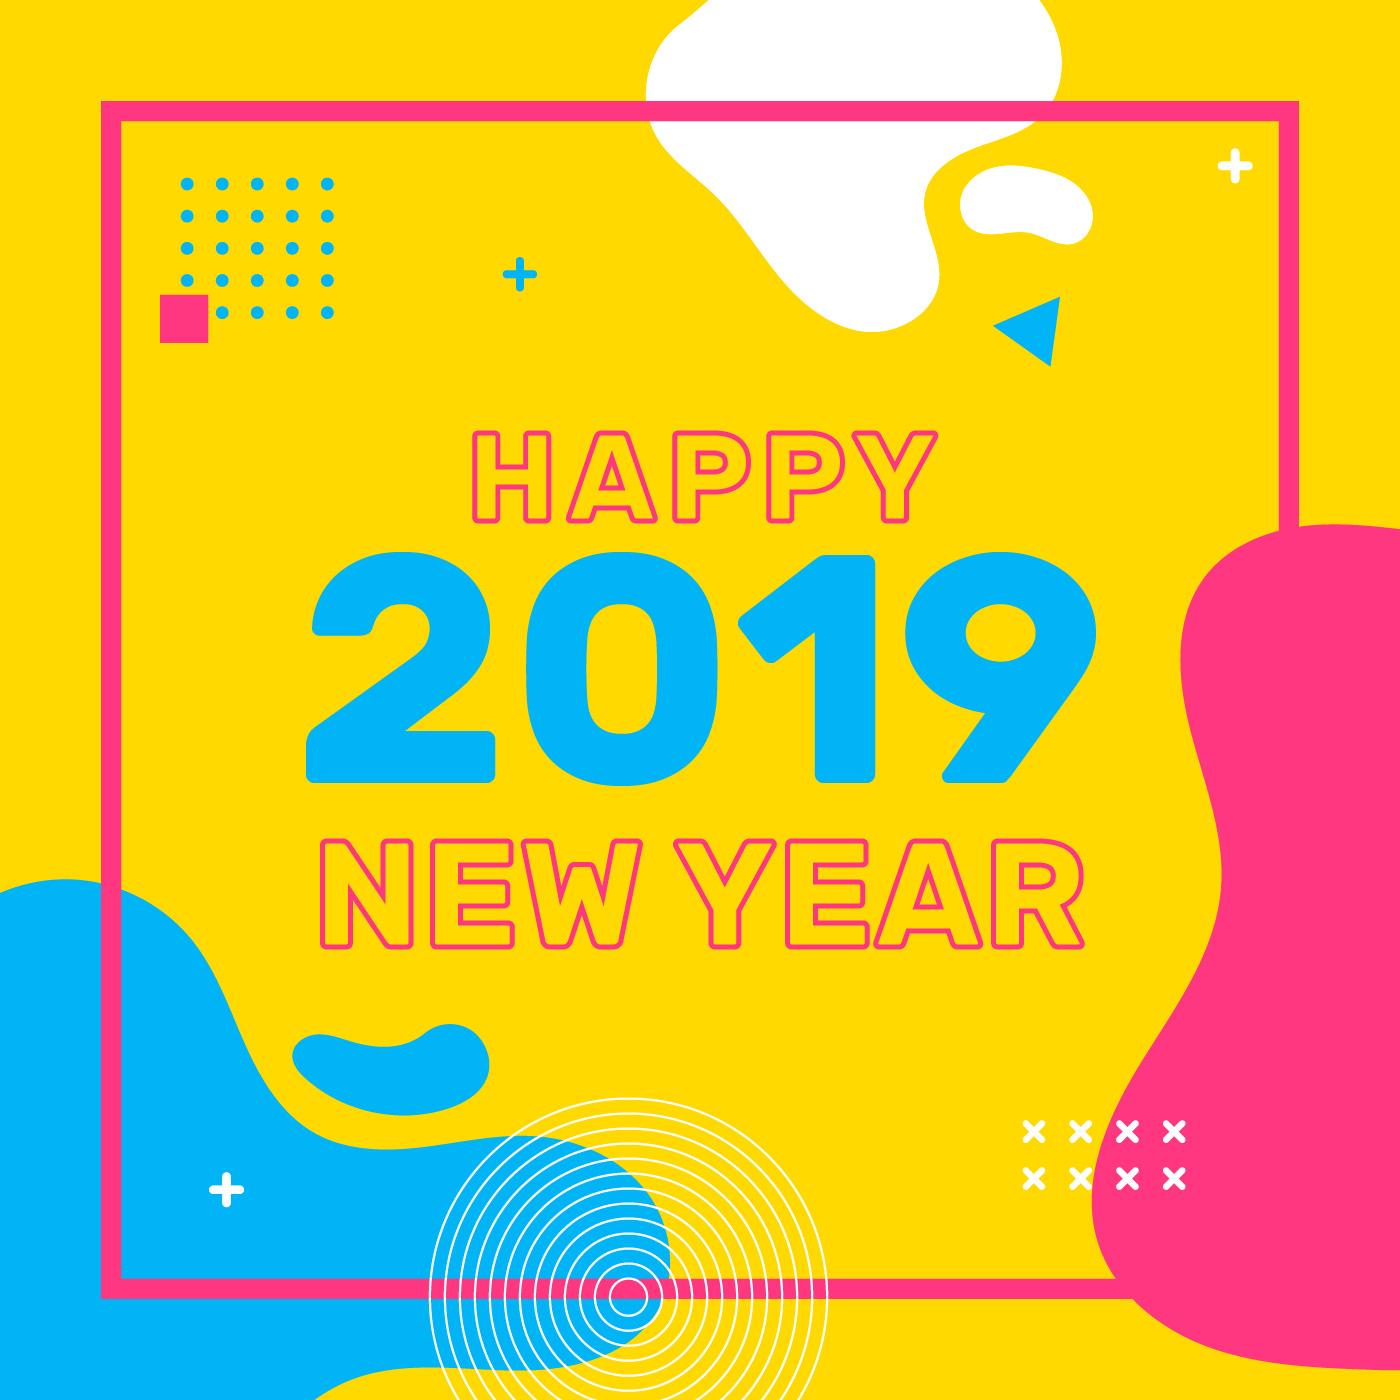 Vector Illustration Instagram: Happy New Year Instagram Post